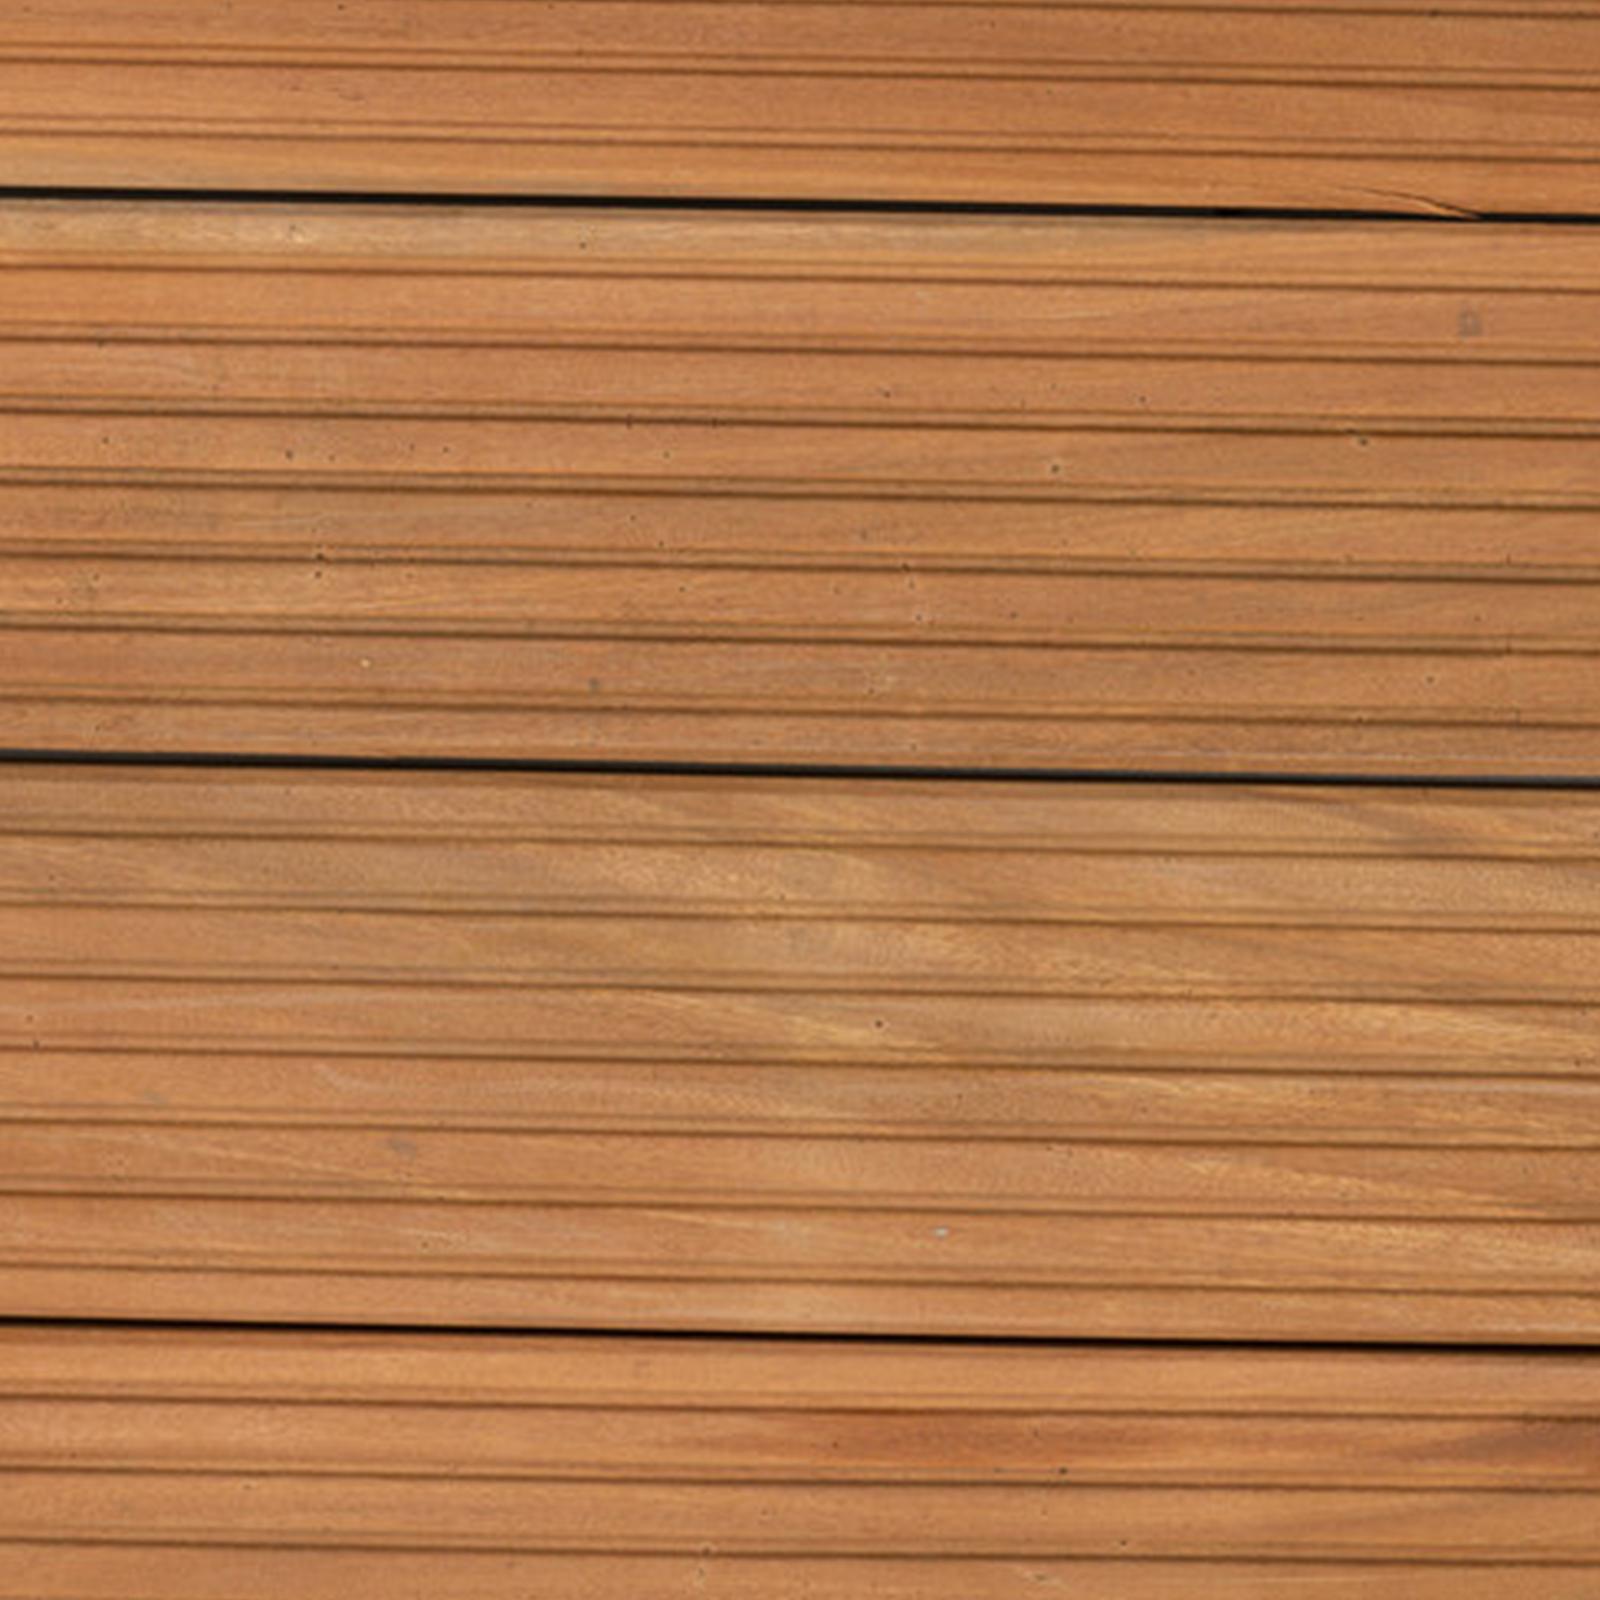 HORI Bangkirai Terrassendielen Komplettset Holz Terrasse Diele ...